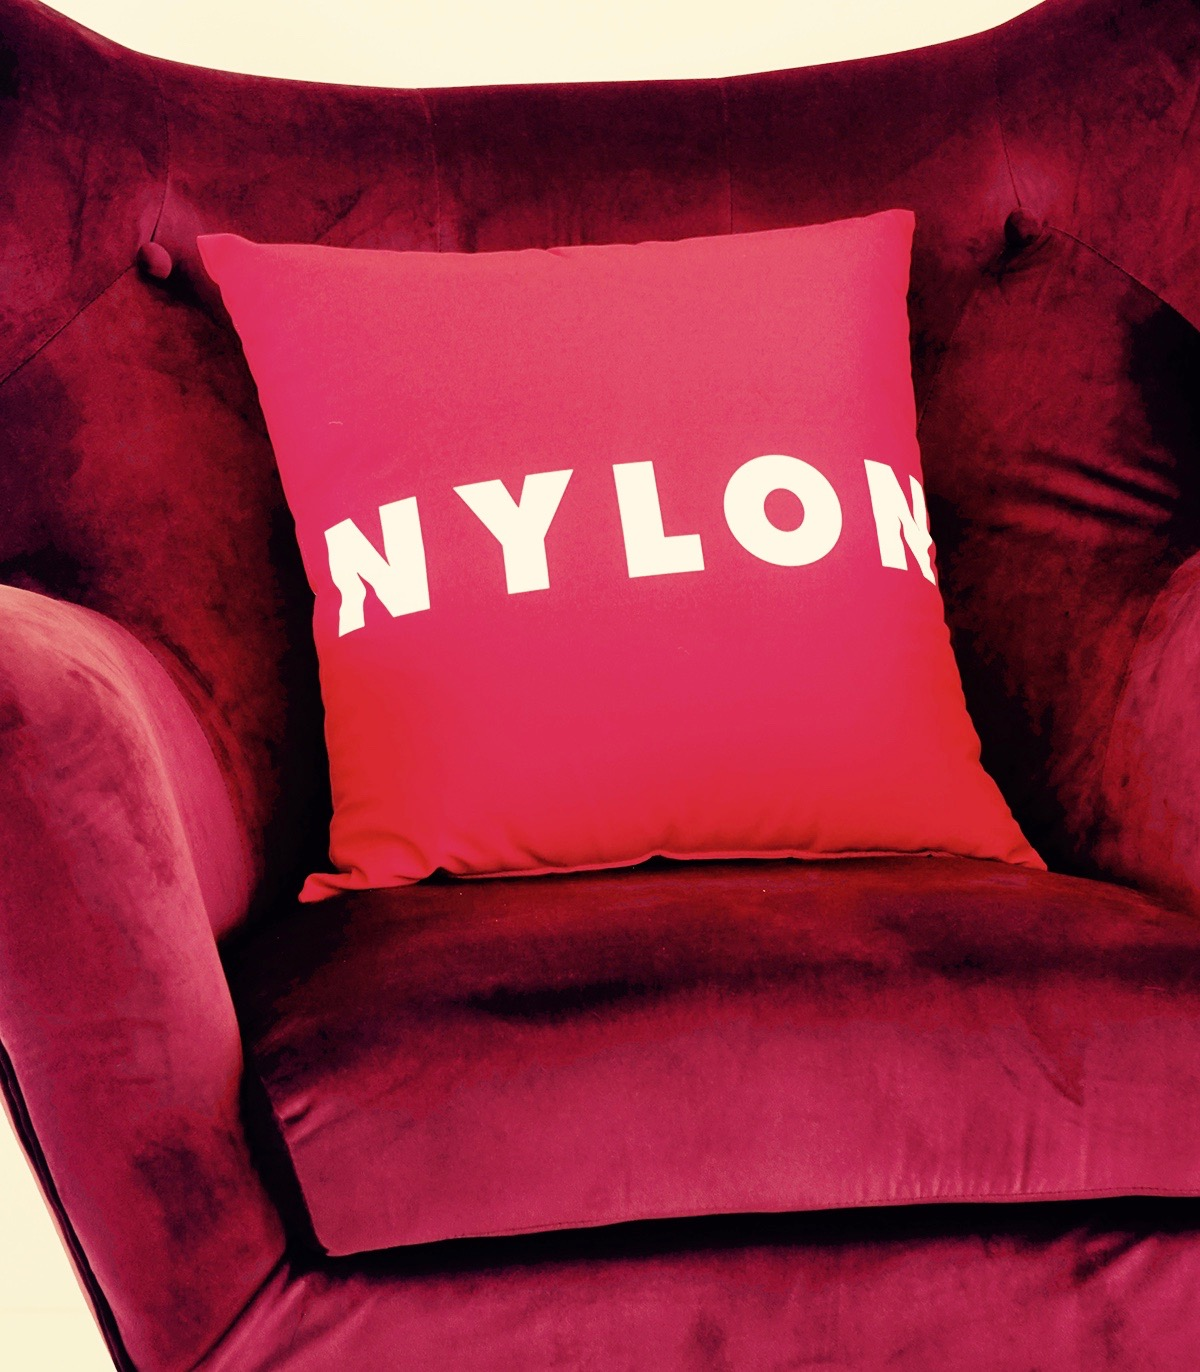 NYLON-CHAIR.jpg